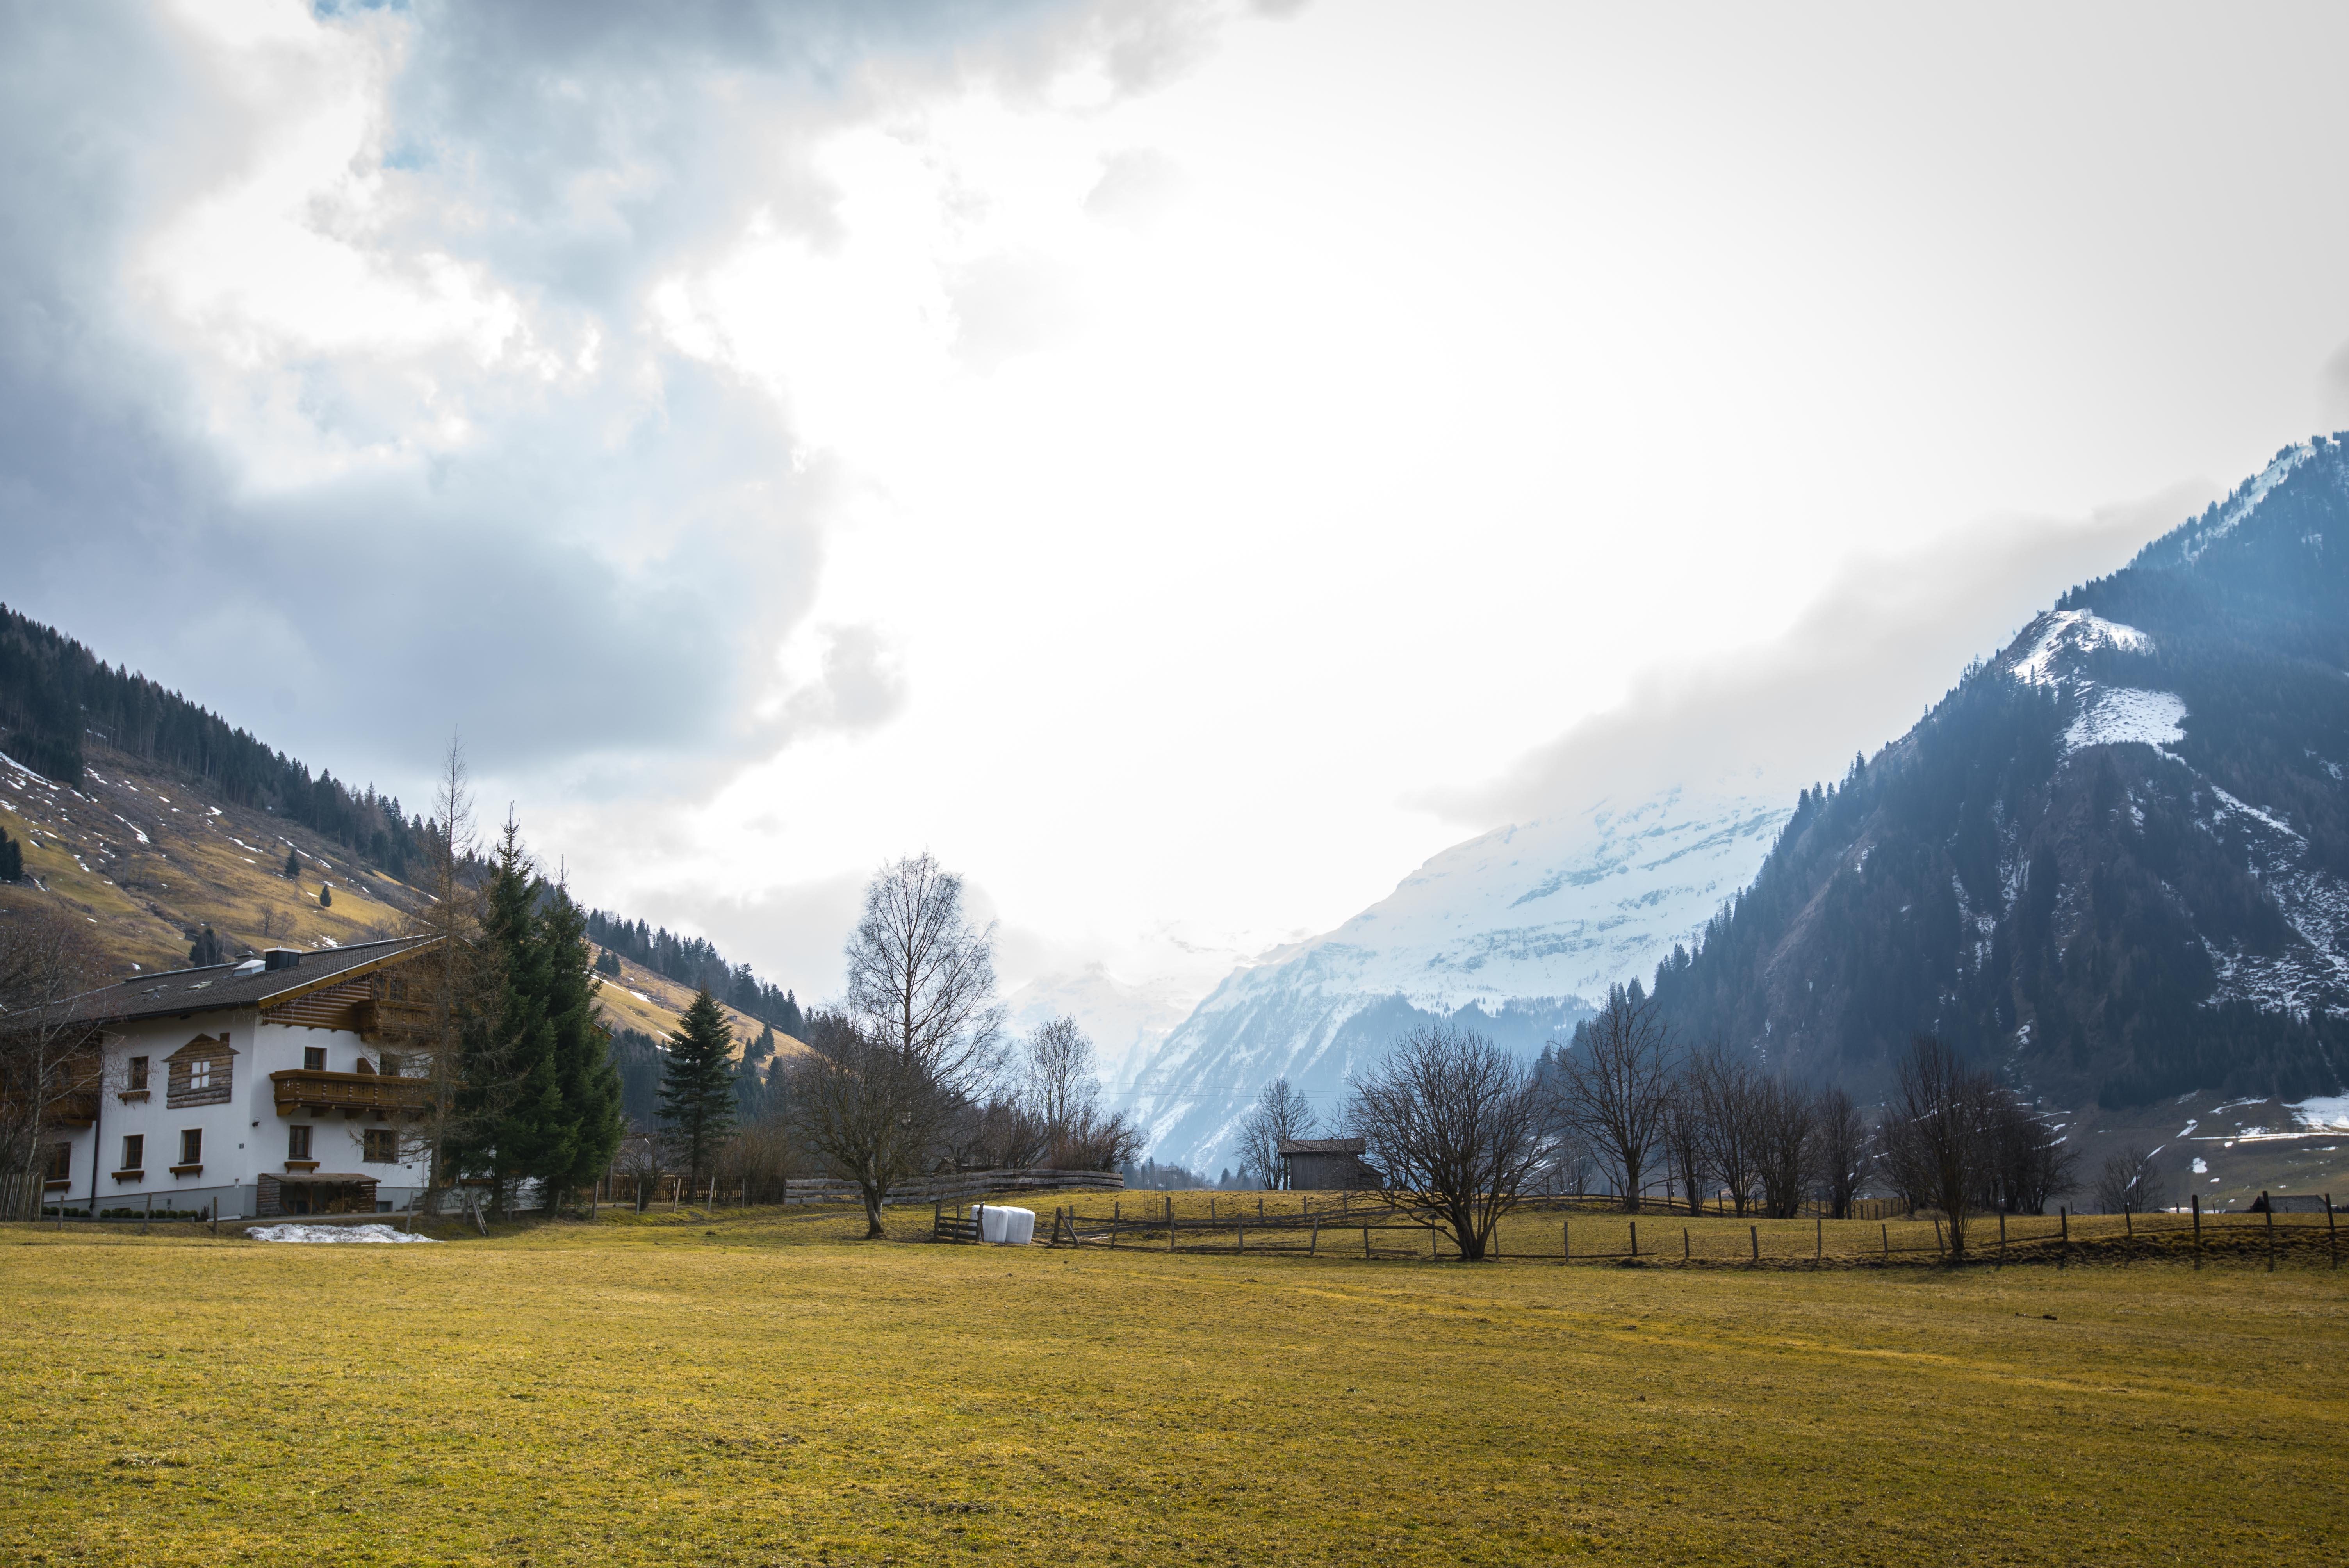 De Berghut